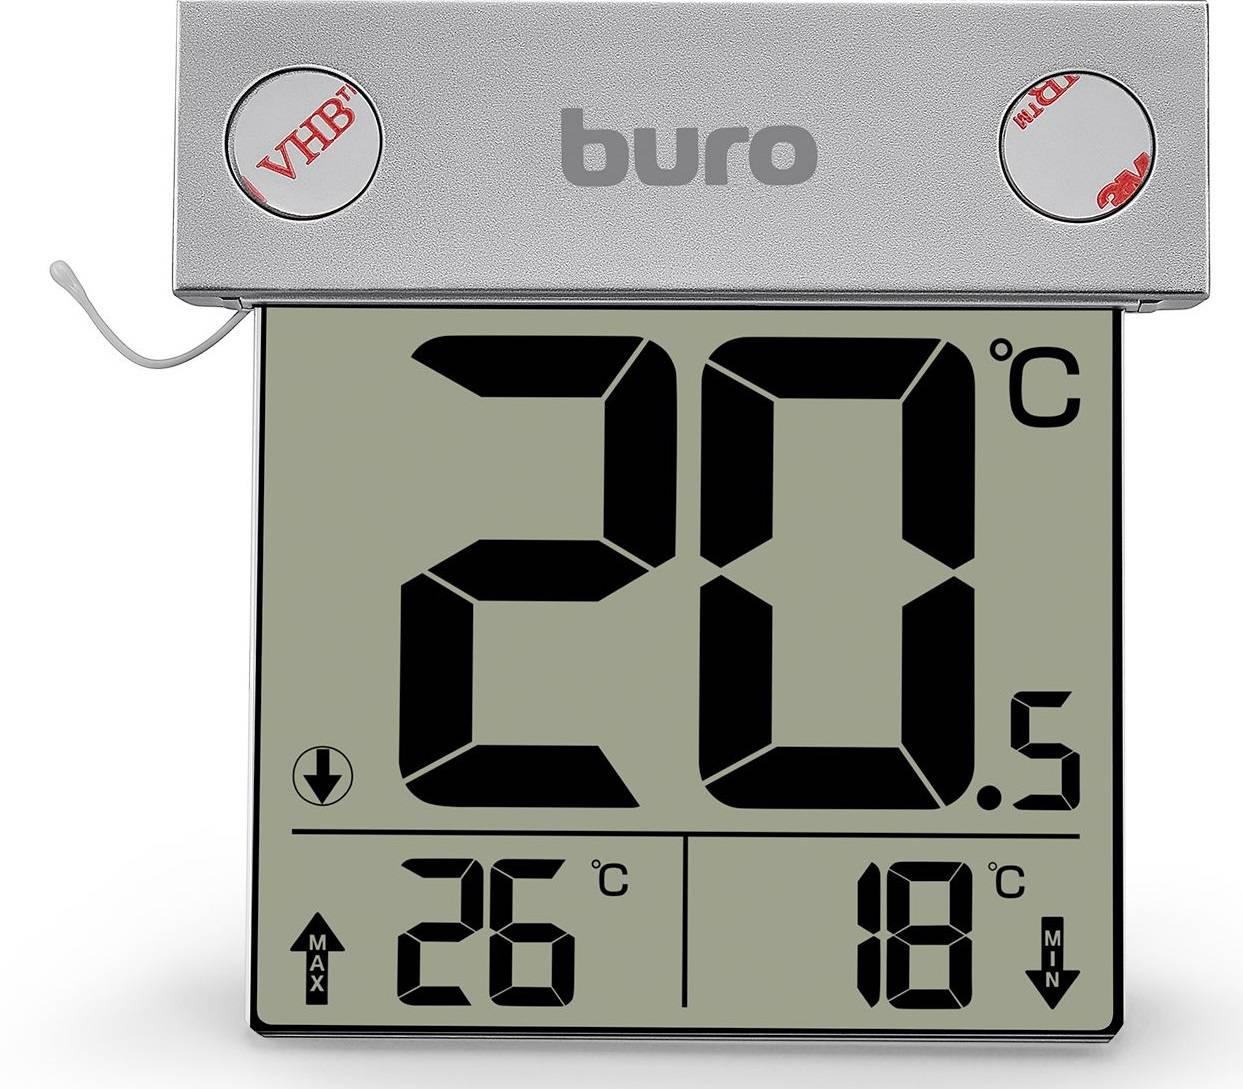 Термометр Buro P-6041 серебристый - фото 1